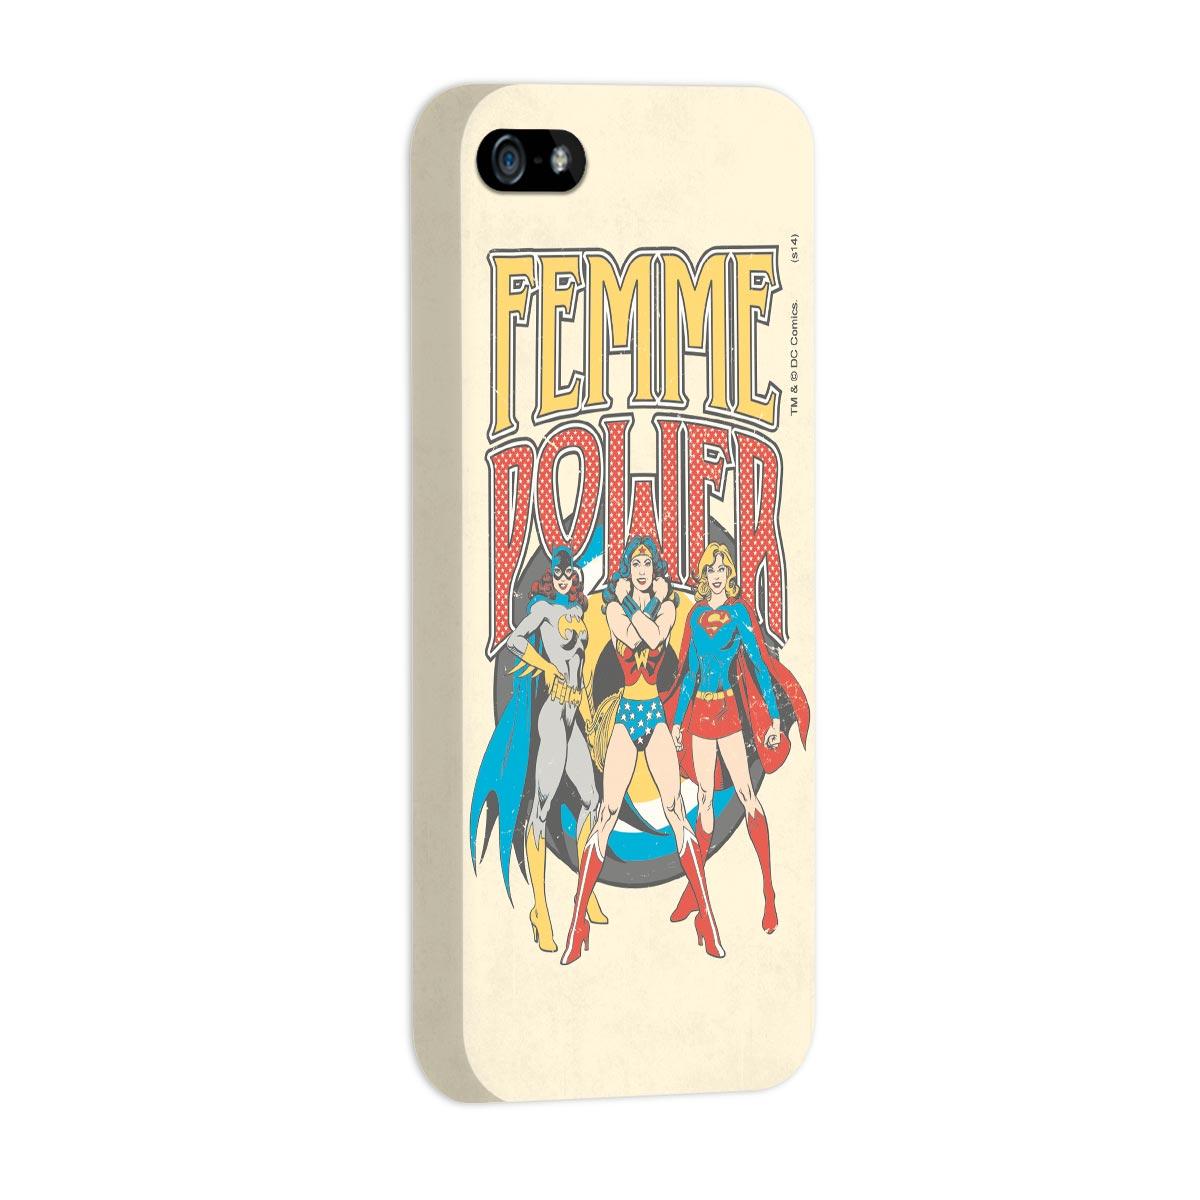 Capa Para iPhone 5/5S Power Girls Femme Power